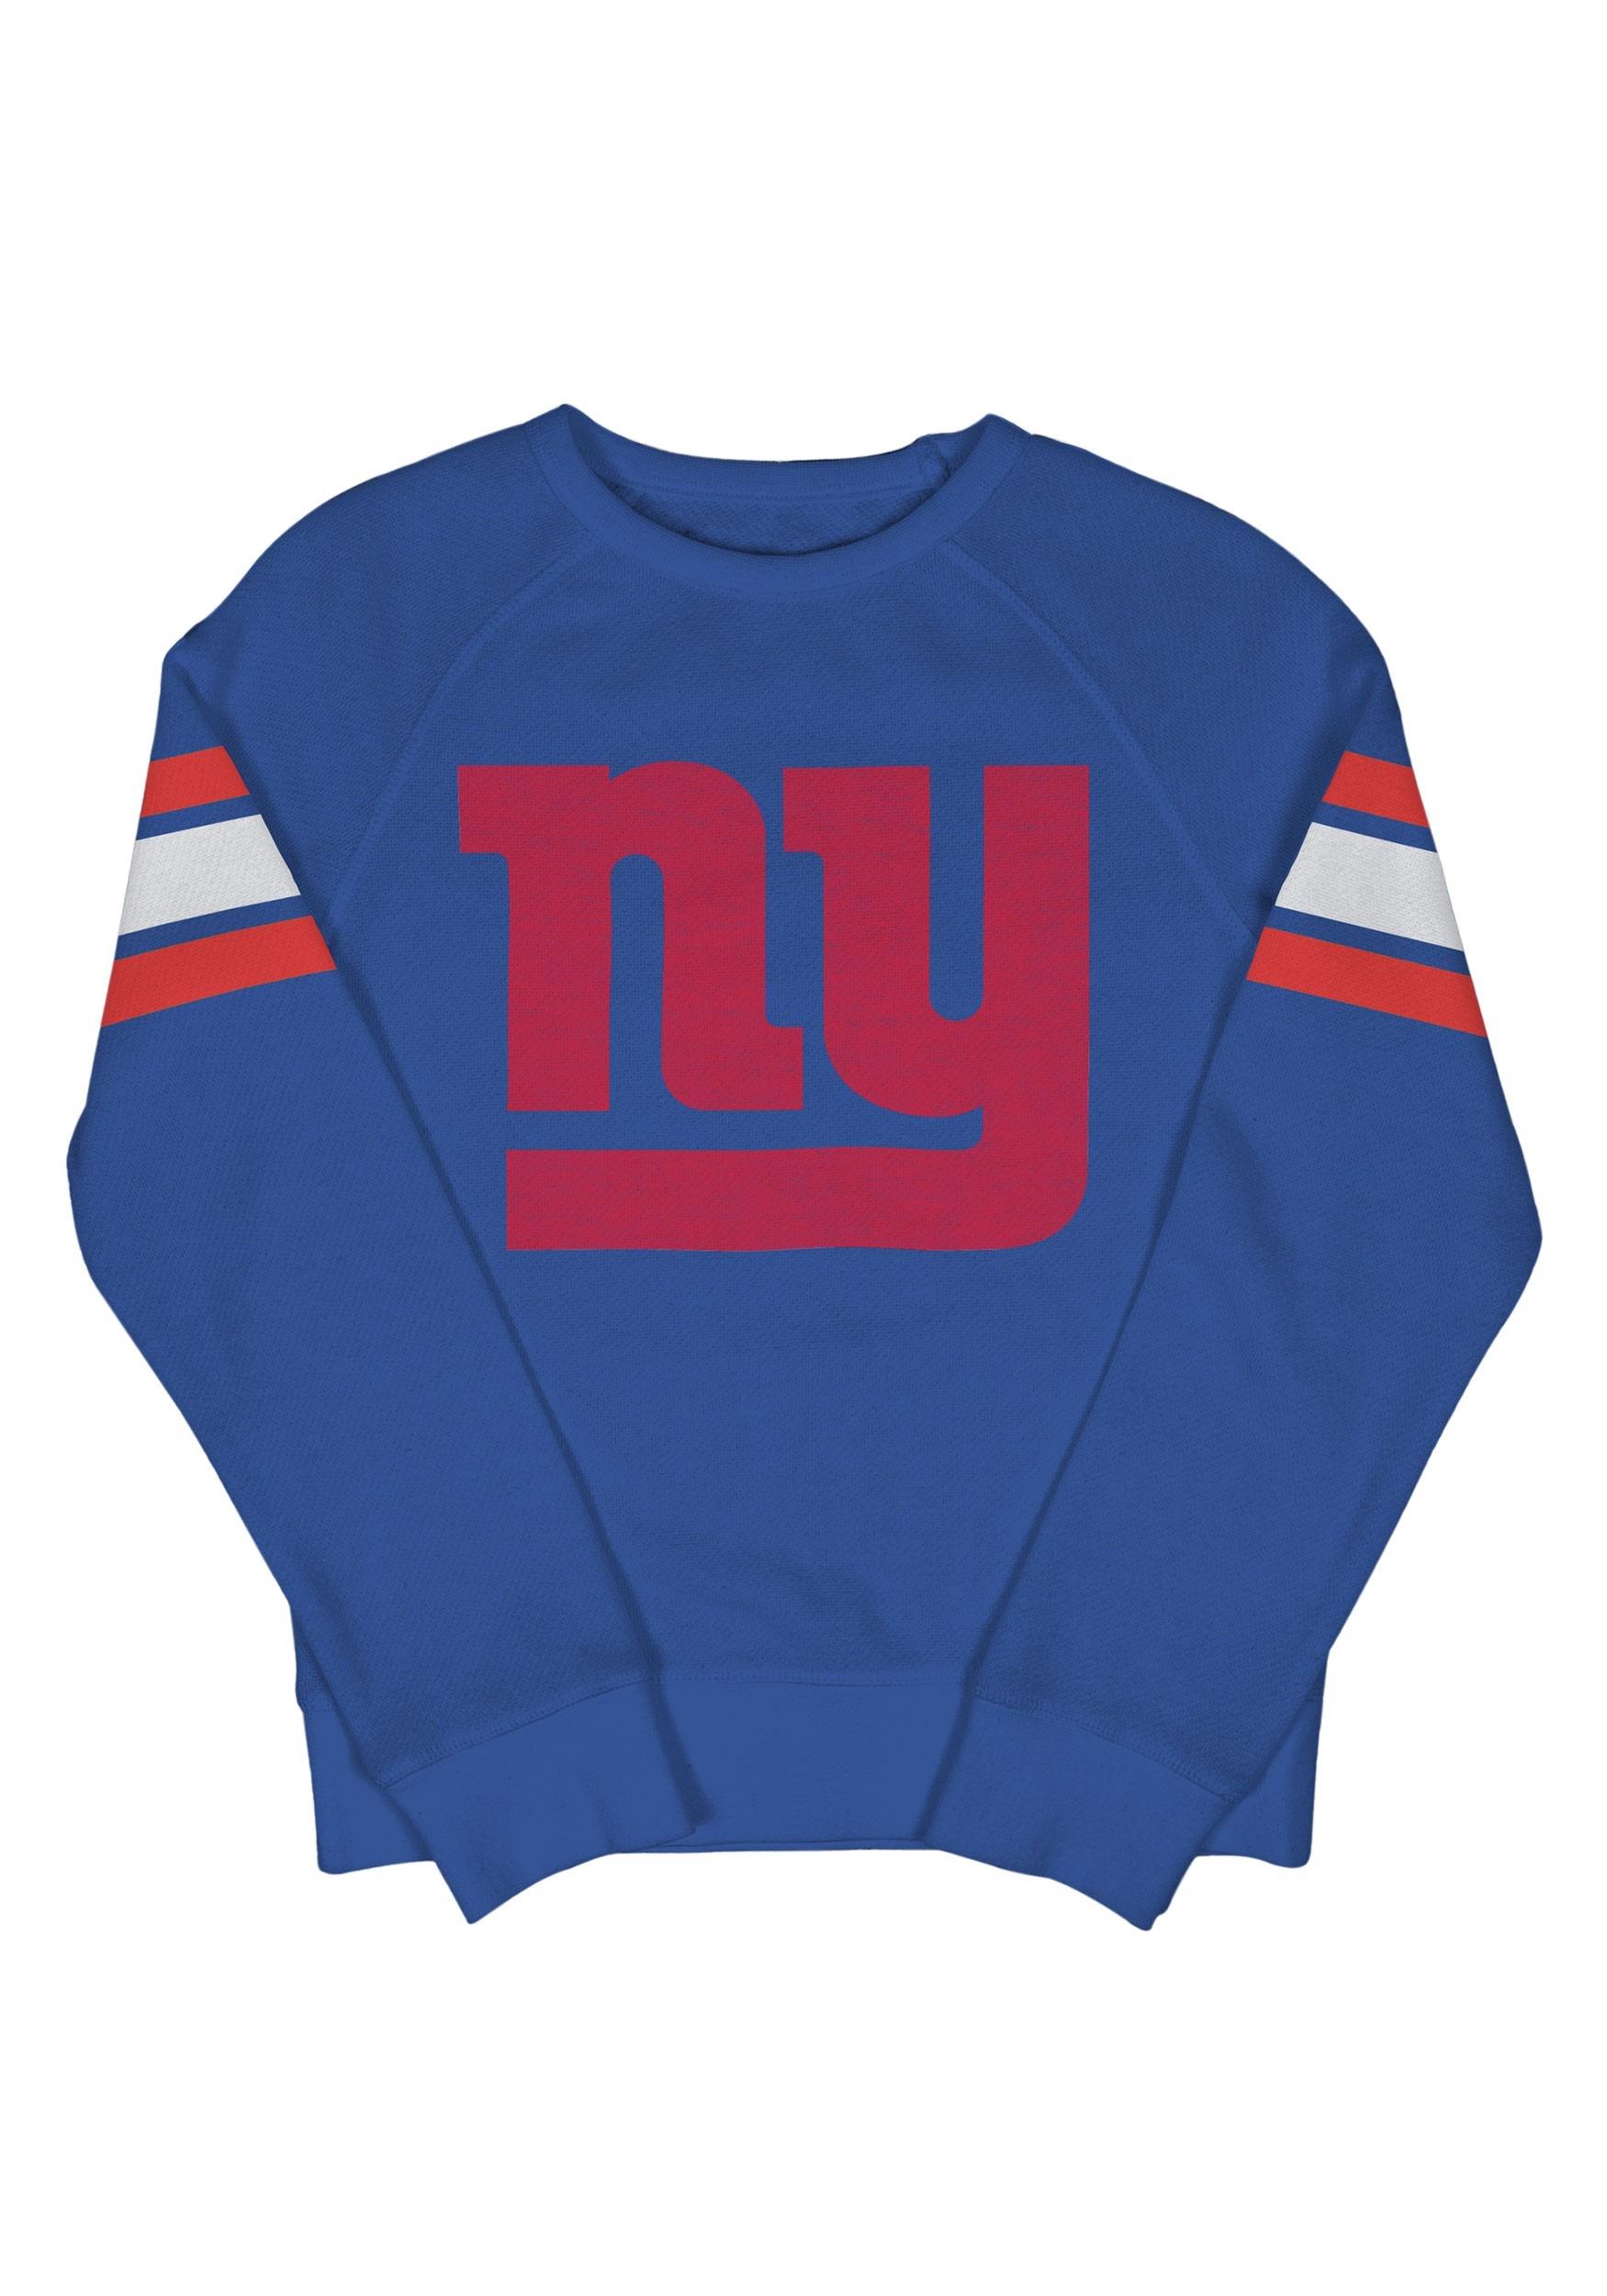 New York Giants Kids Fleece Blue Crewneck Sweater